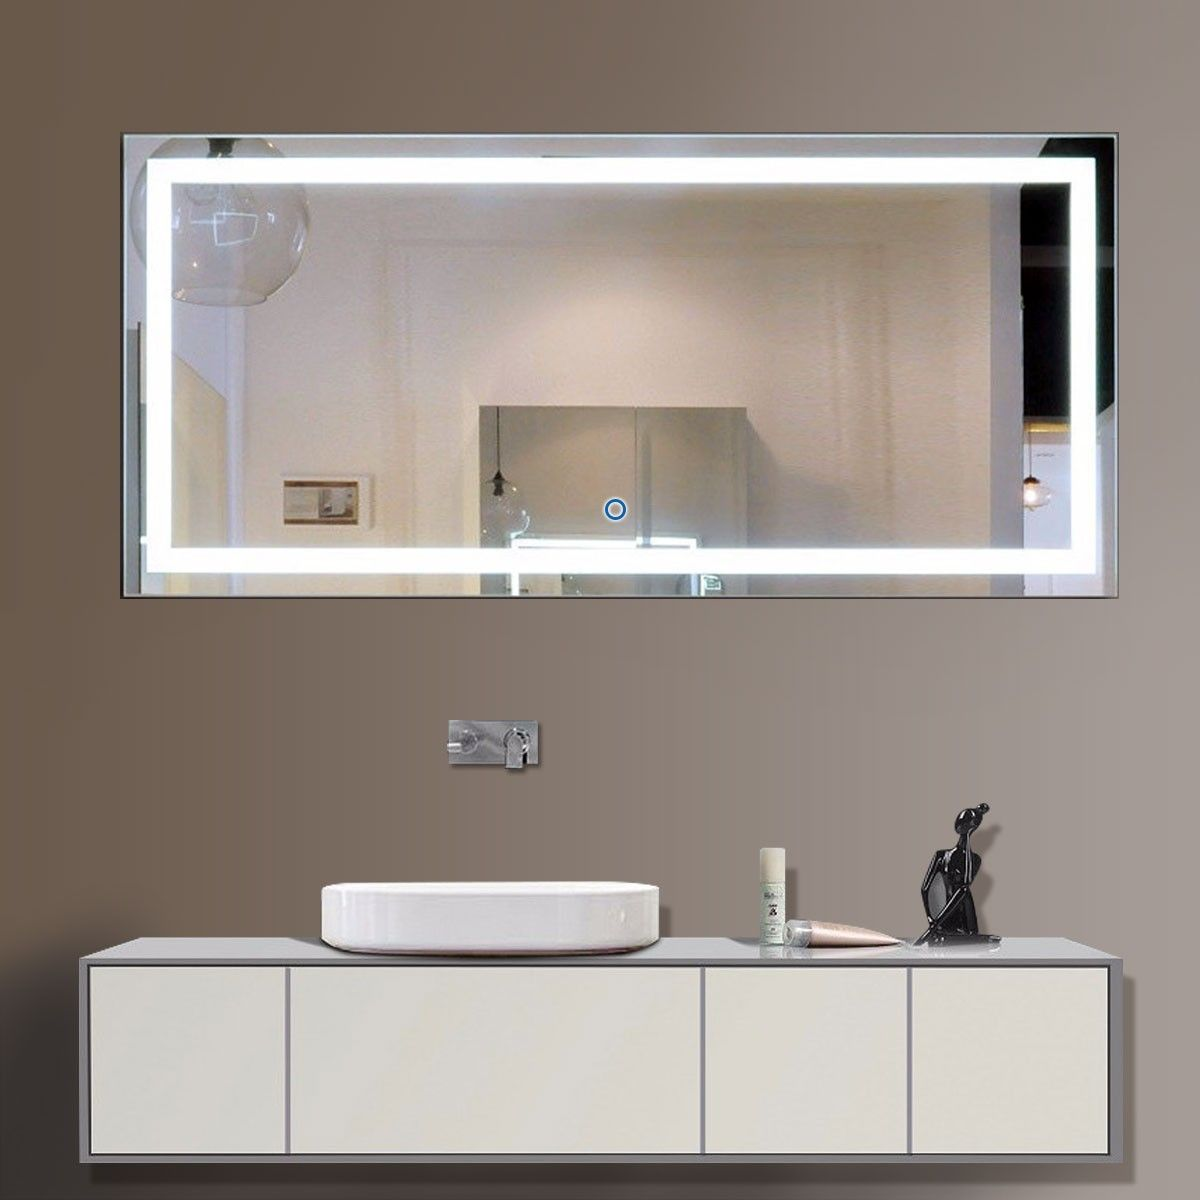 Best Of Small Bathroom Wall Mirror